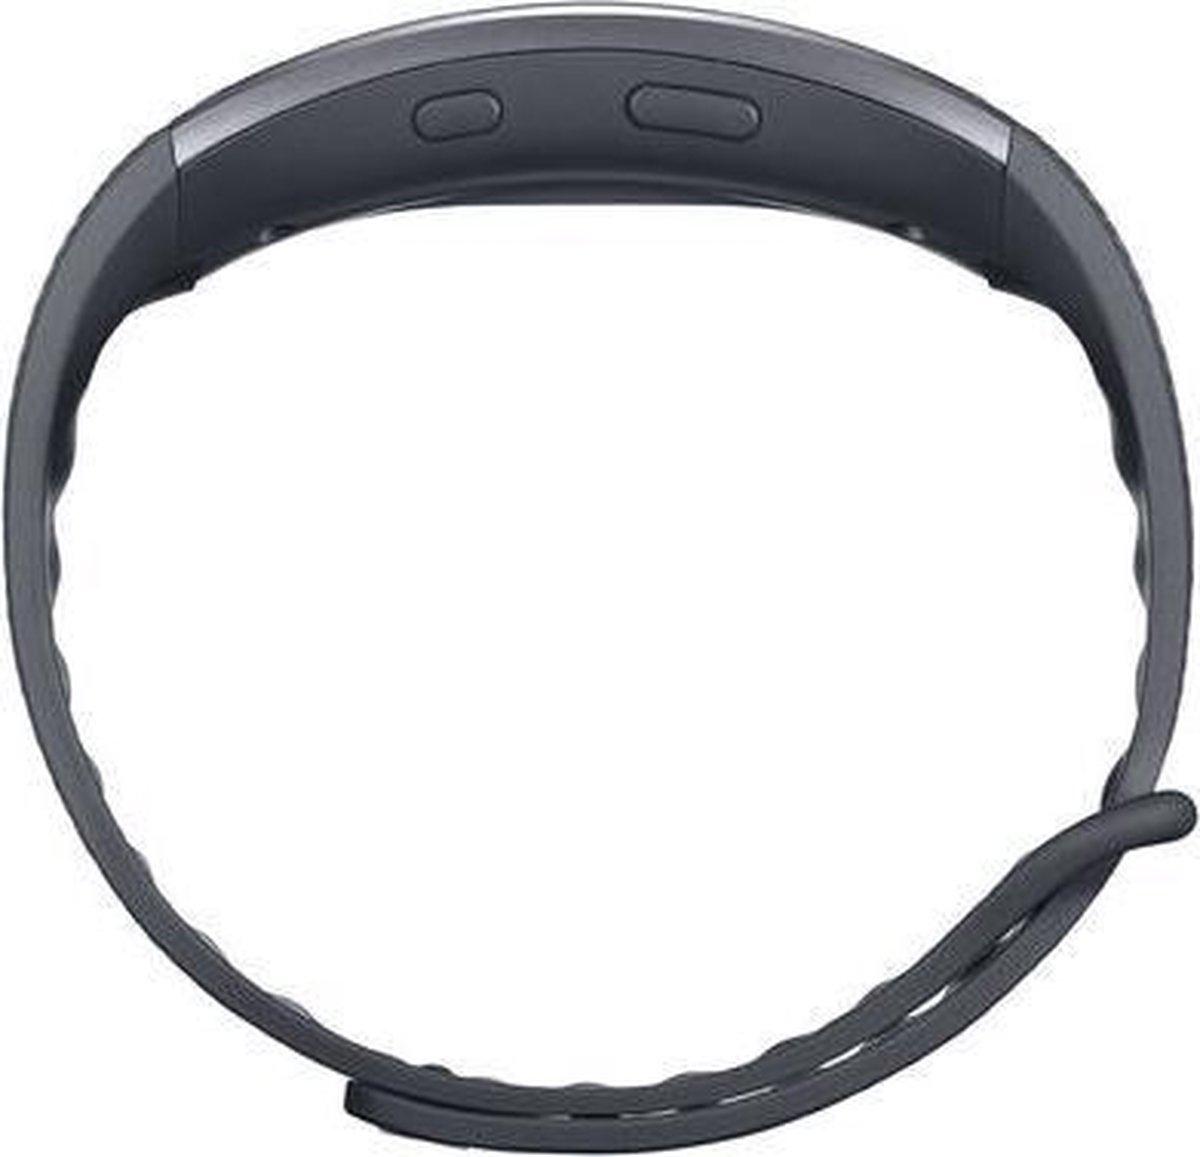 Samsung Gear Fit2 Small - Grijs - Samsung